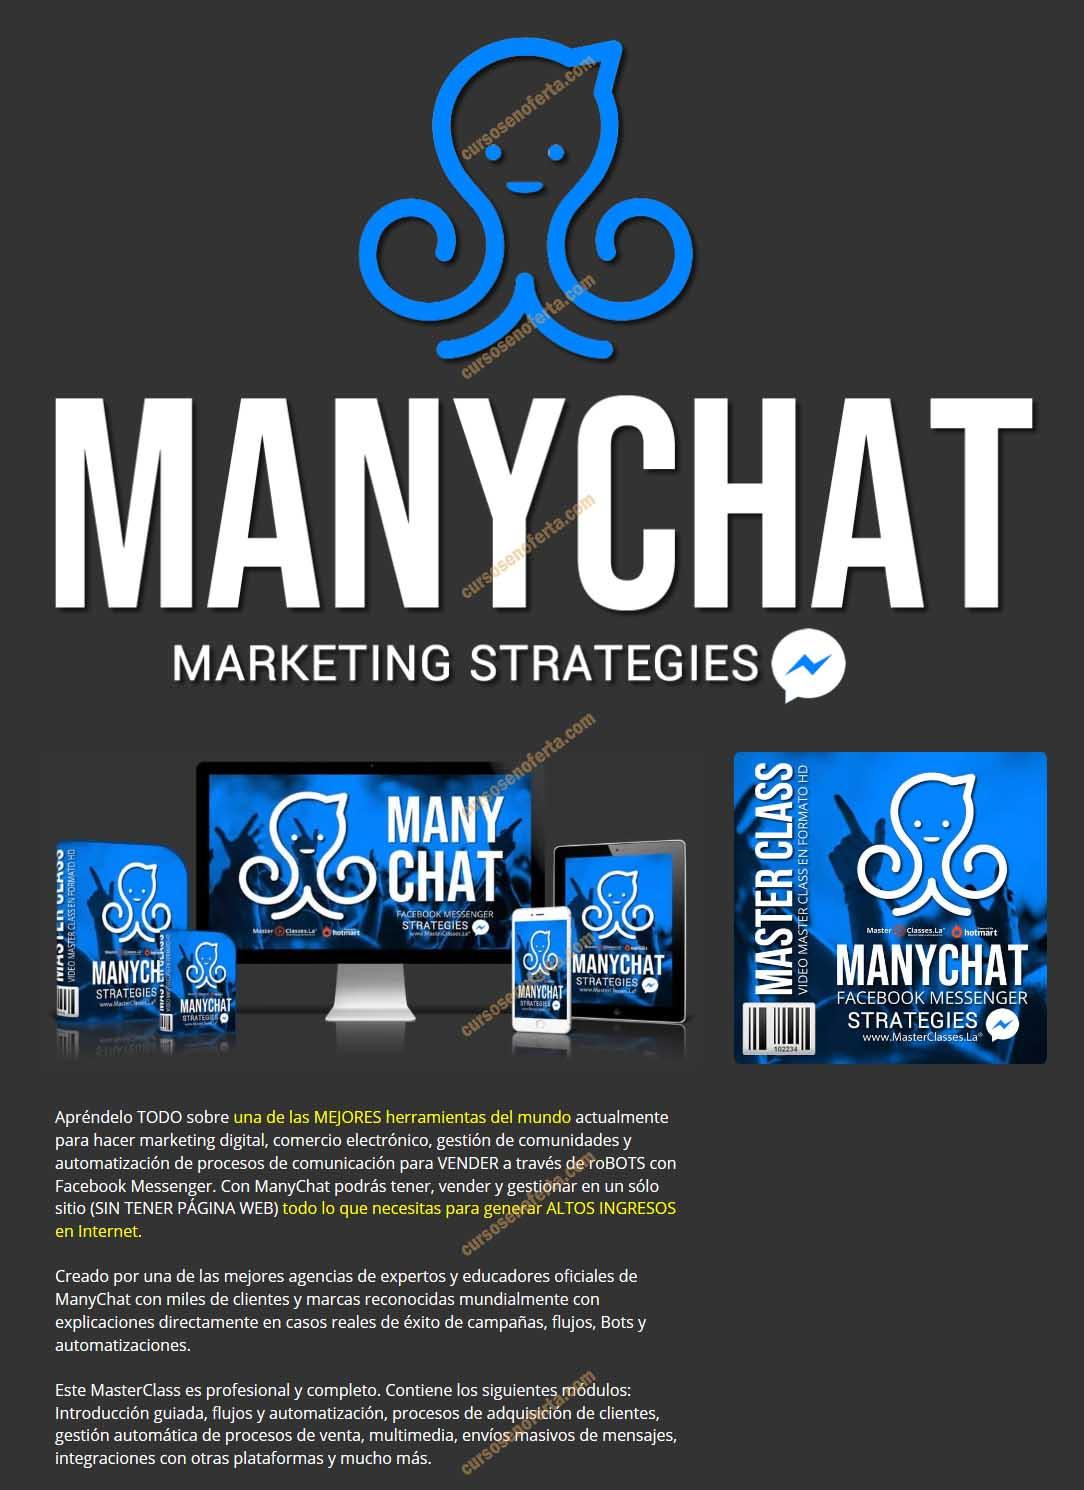 Manychat Strategies